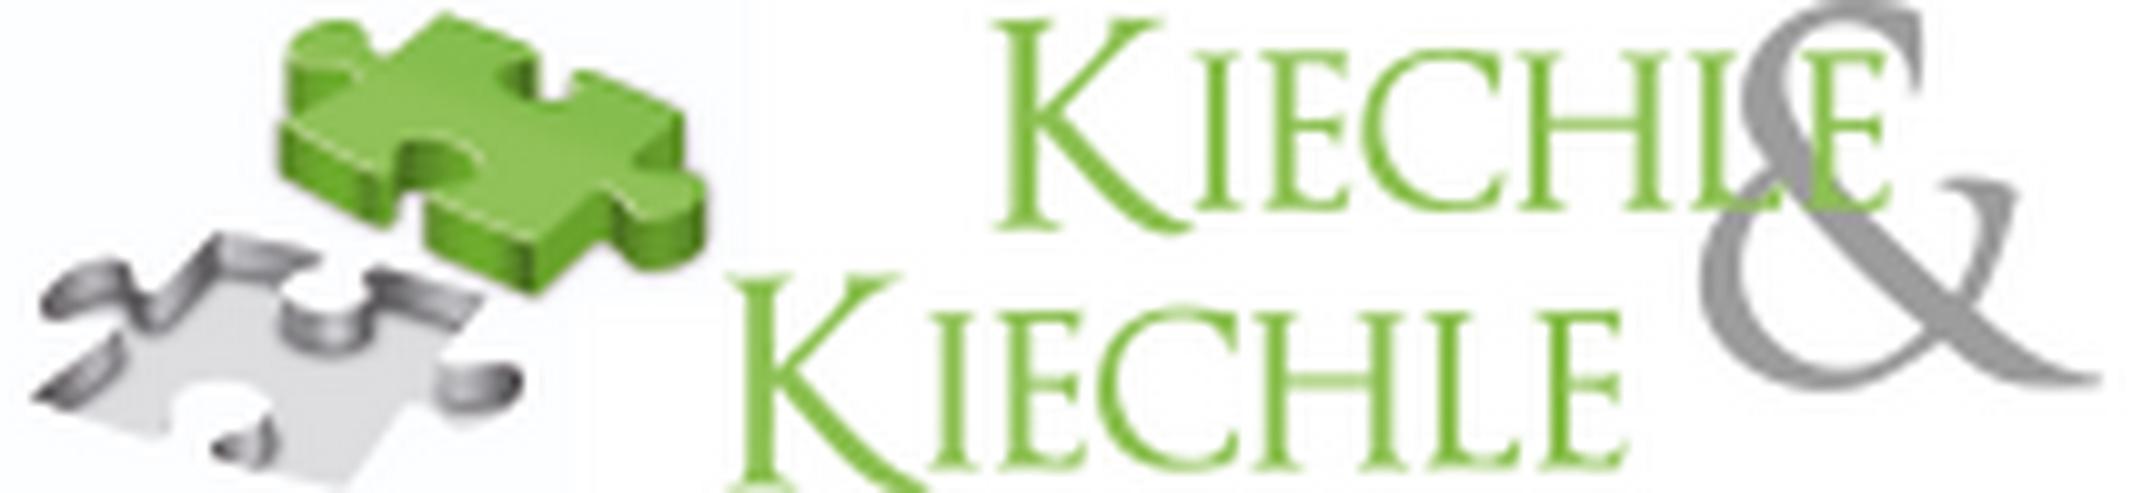 Erwin Kiechle Versicherungsmakler